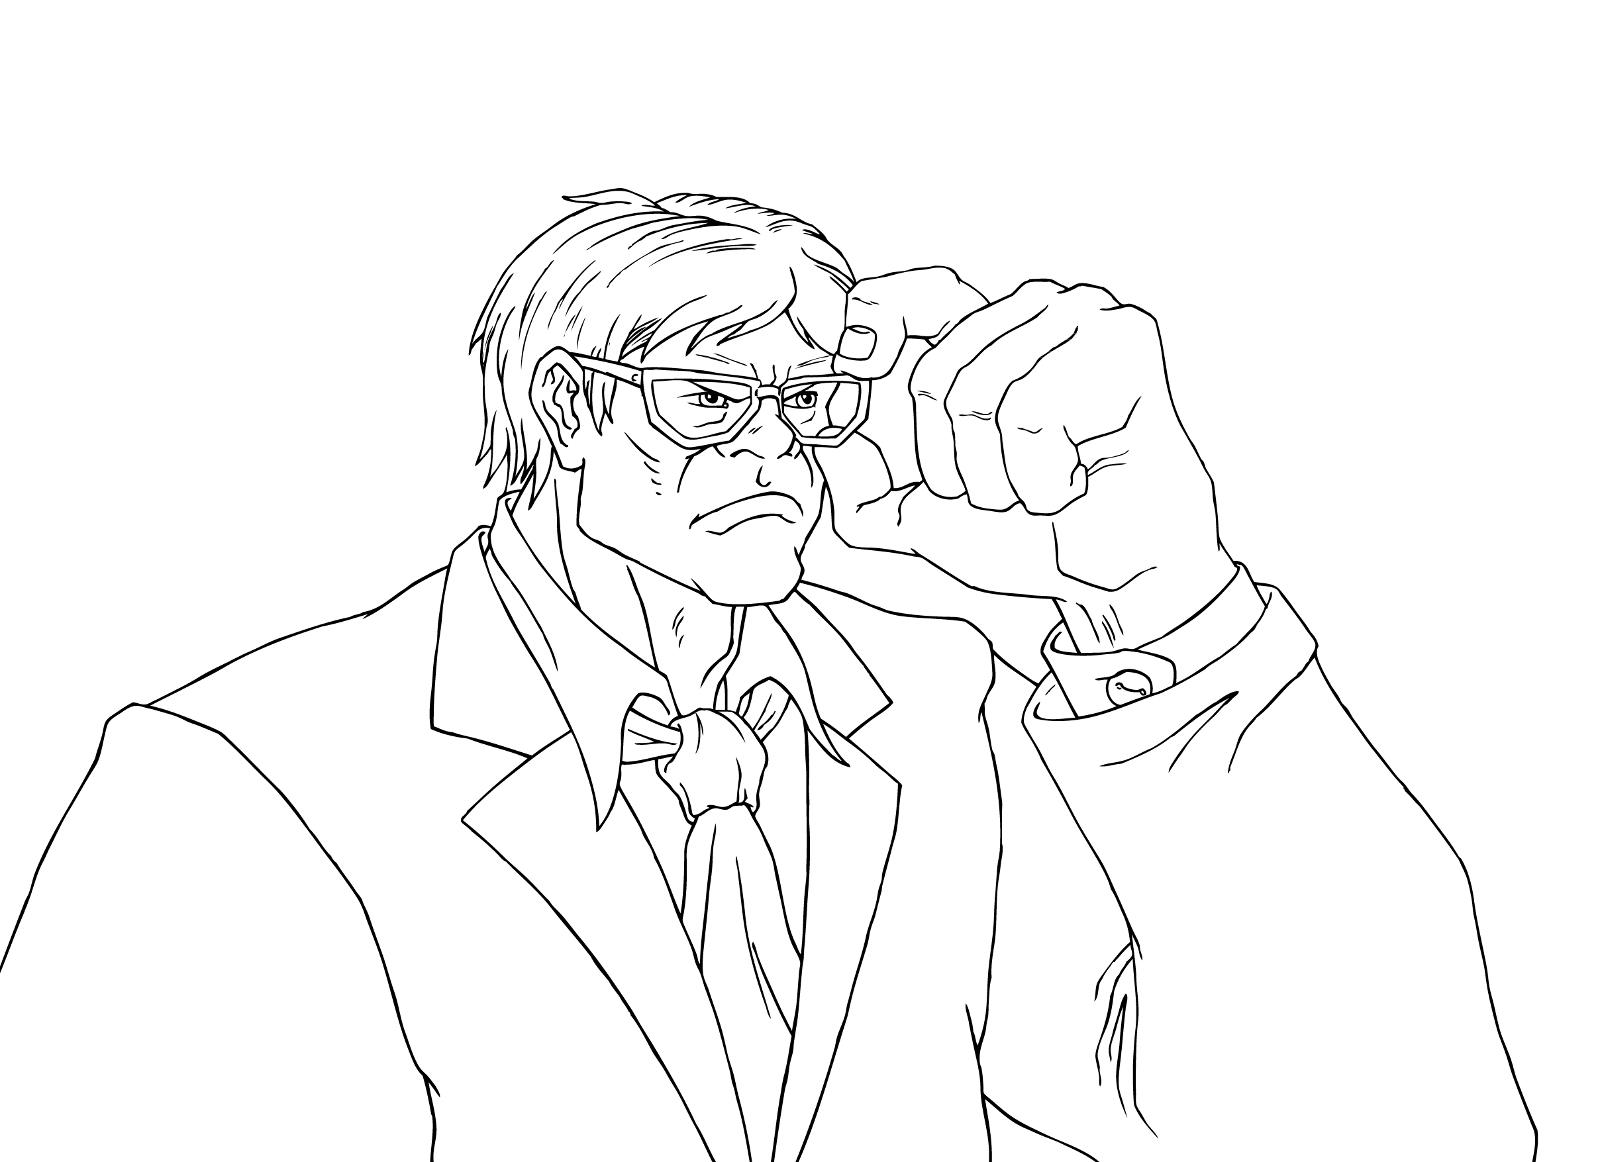 Nerd Hulk (Line Art)